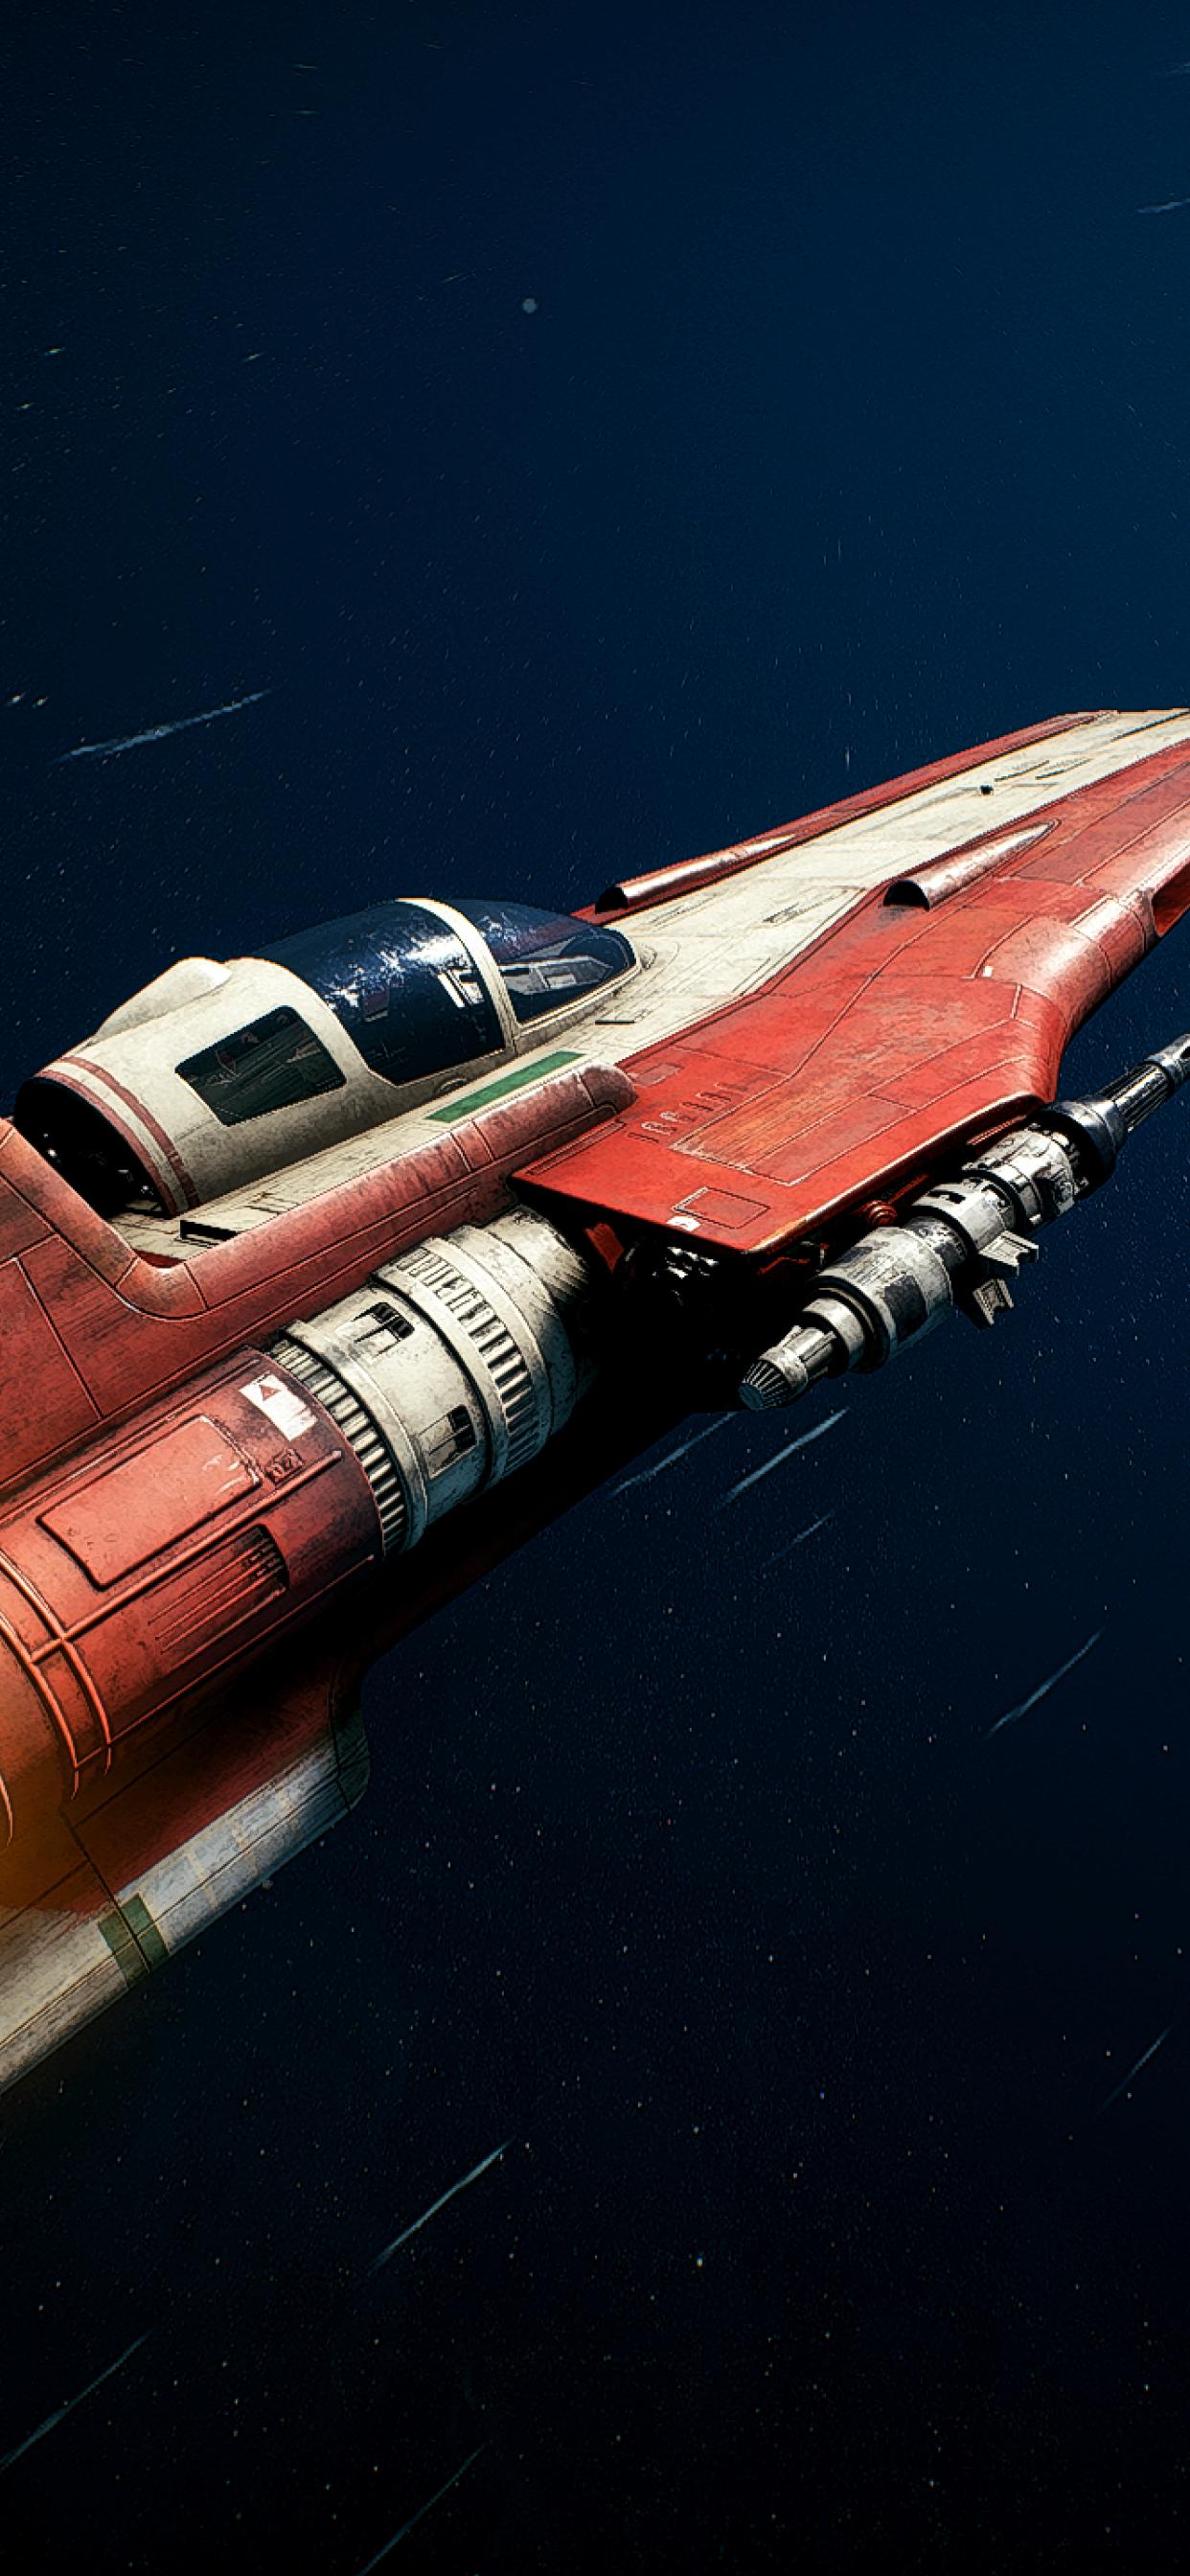 Star Wars Battlefront 2 Wallpaper Iphone ~ Free Games Info ...